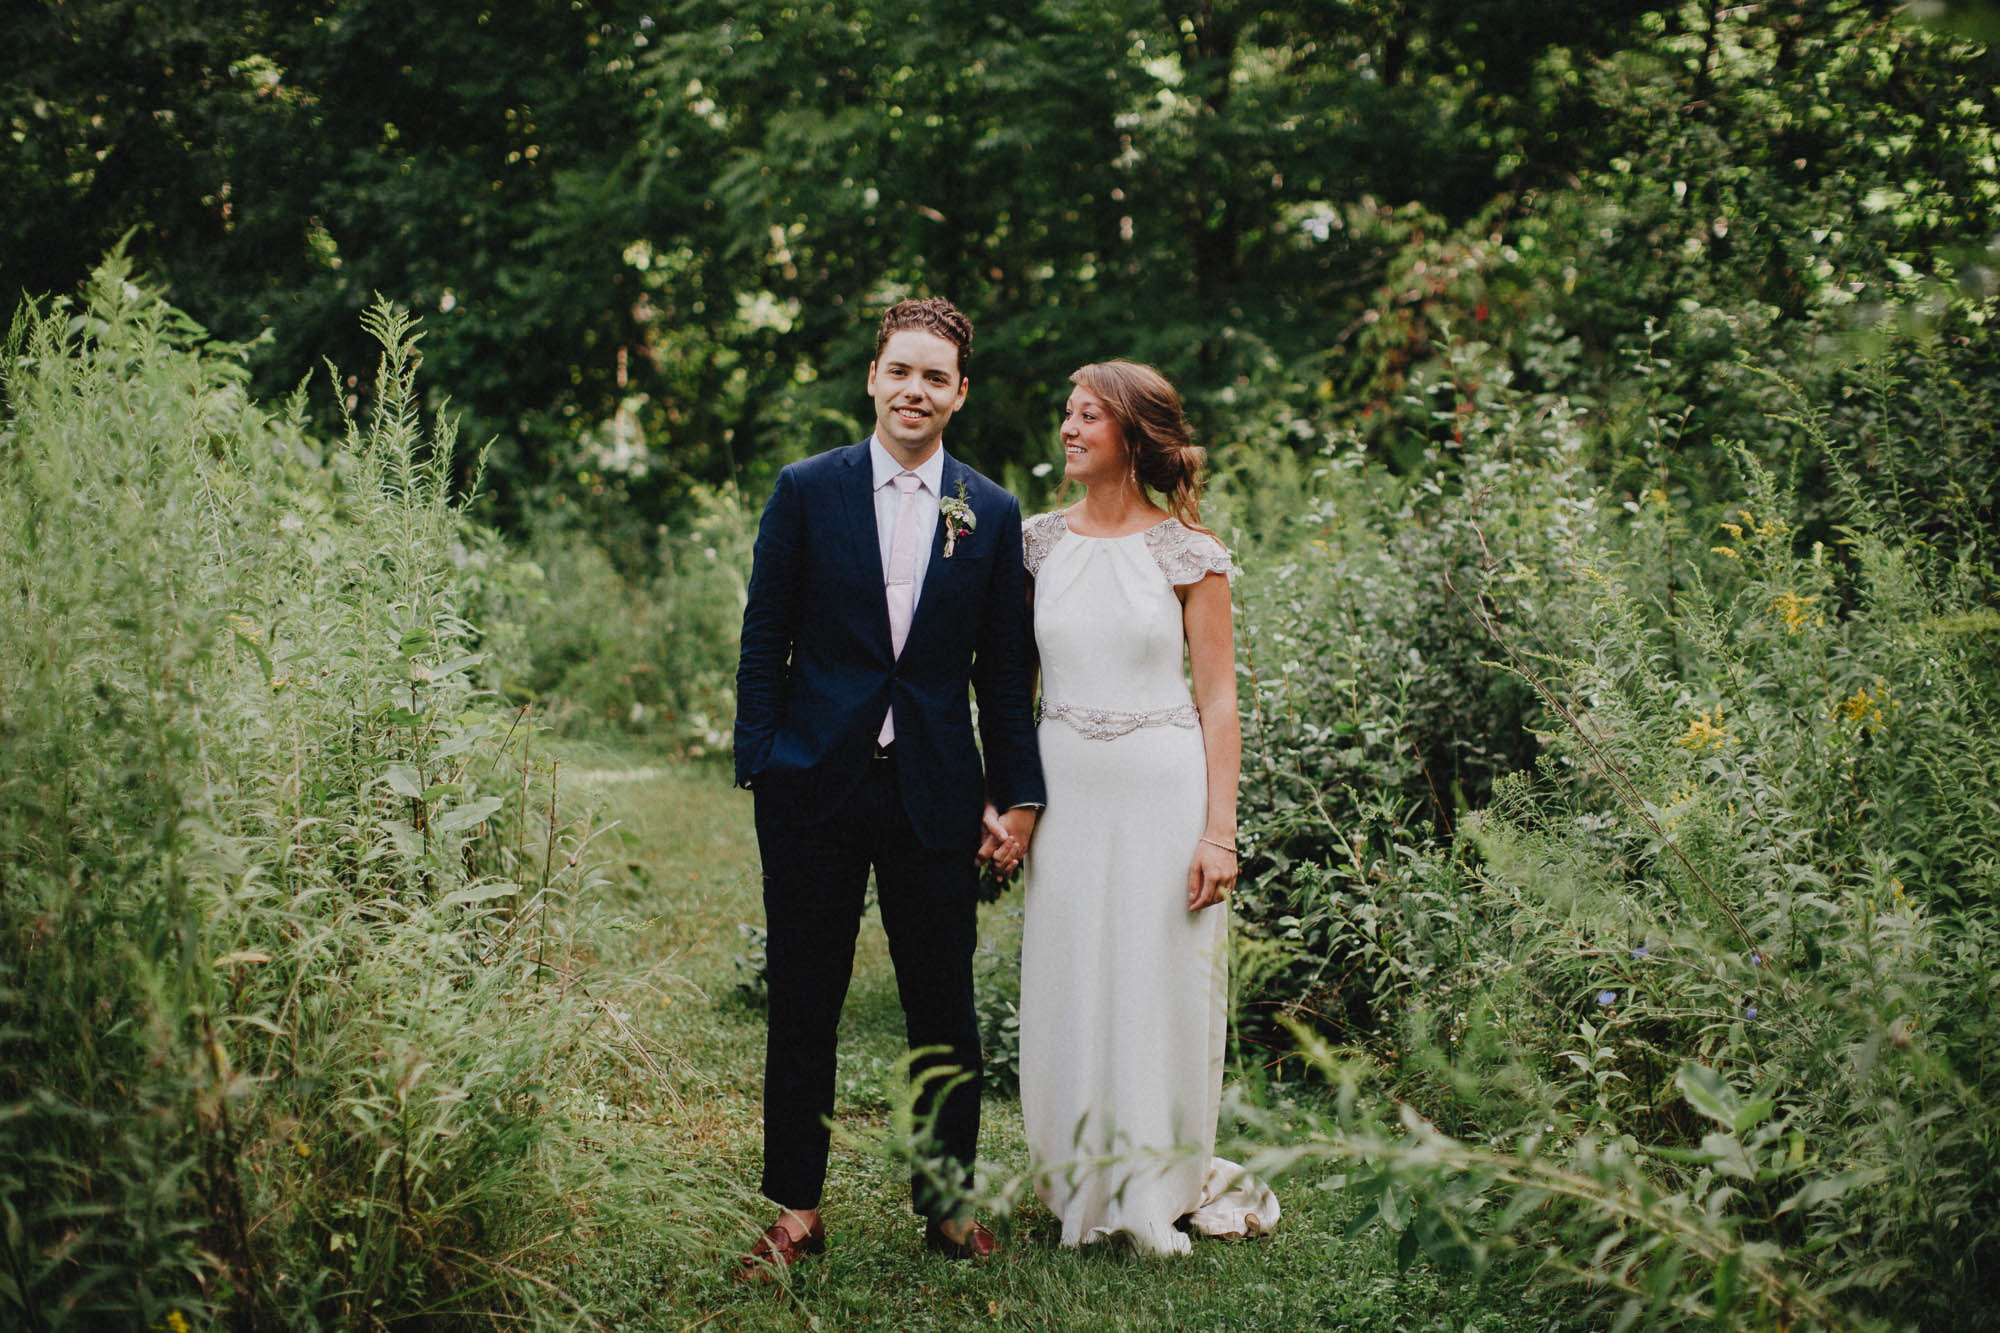 Leah-Graham-Michigan-Outdoor-DIY-Wedding-082@2x.jpg